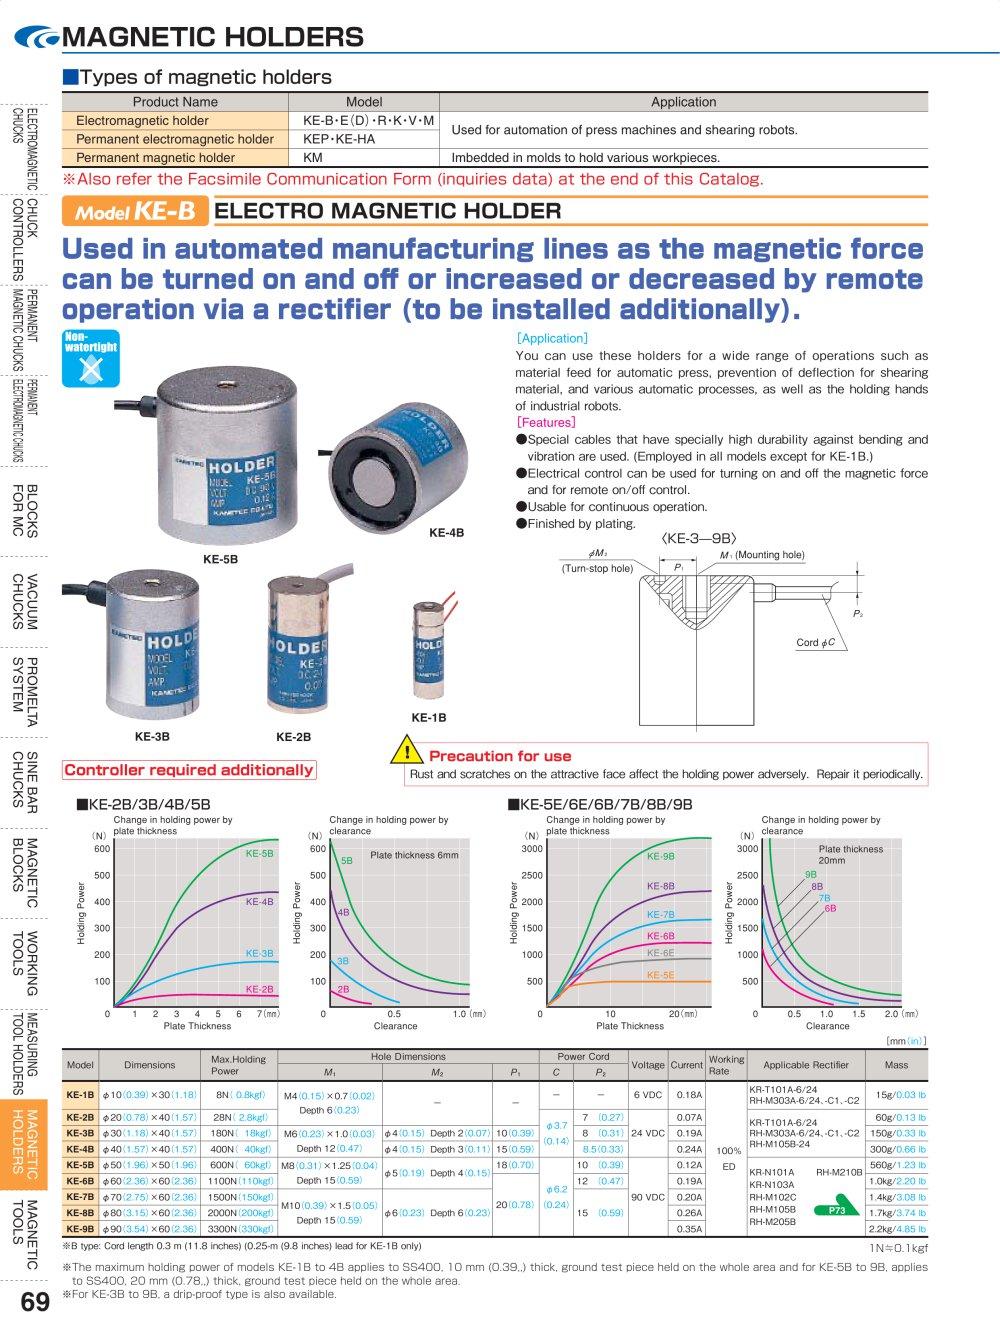 MAGNETIC HOLDERS Kanetec PDF Catalogue Technical Documentation